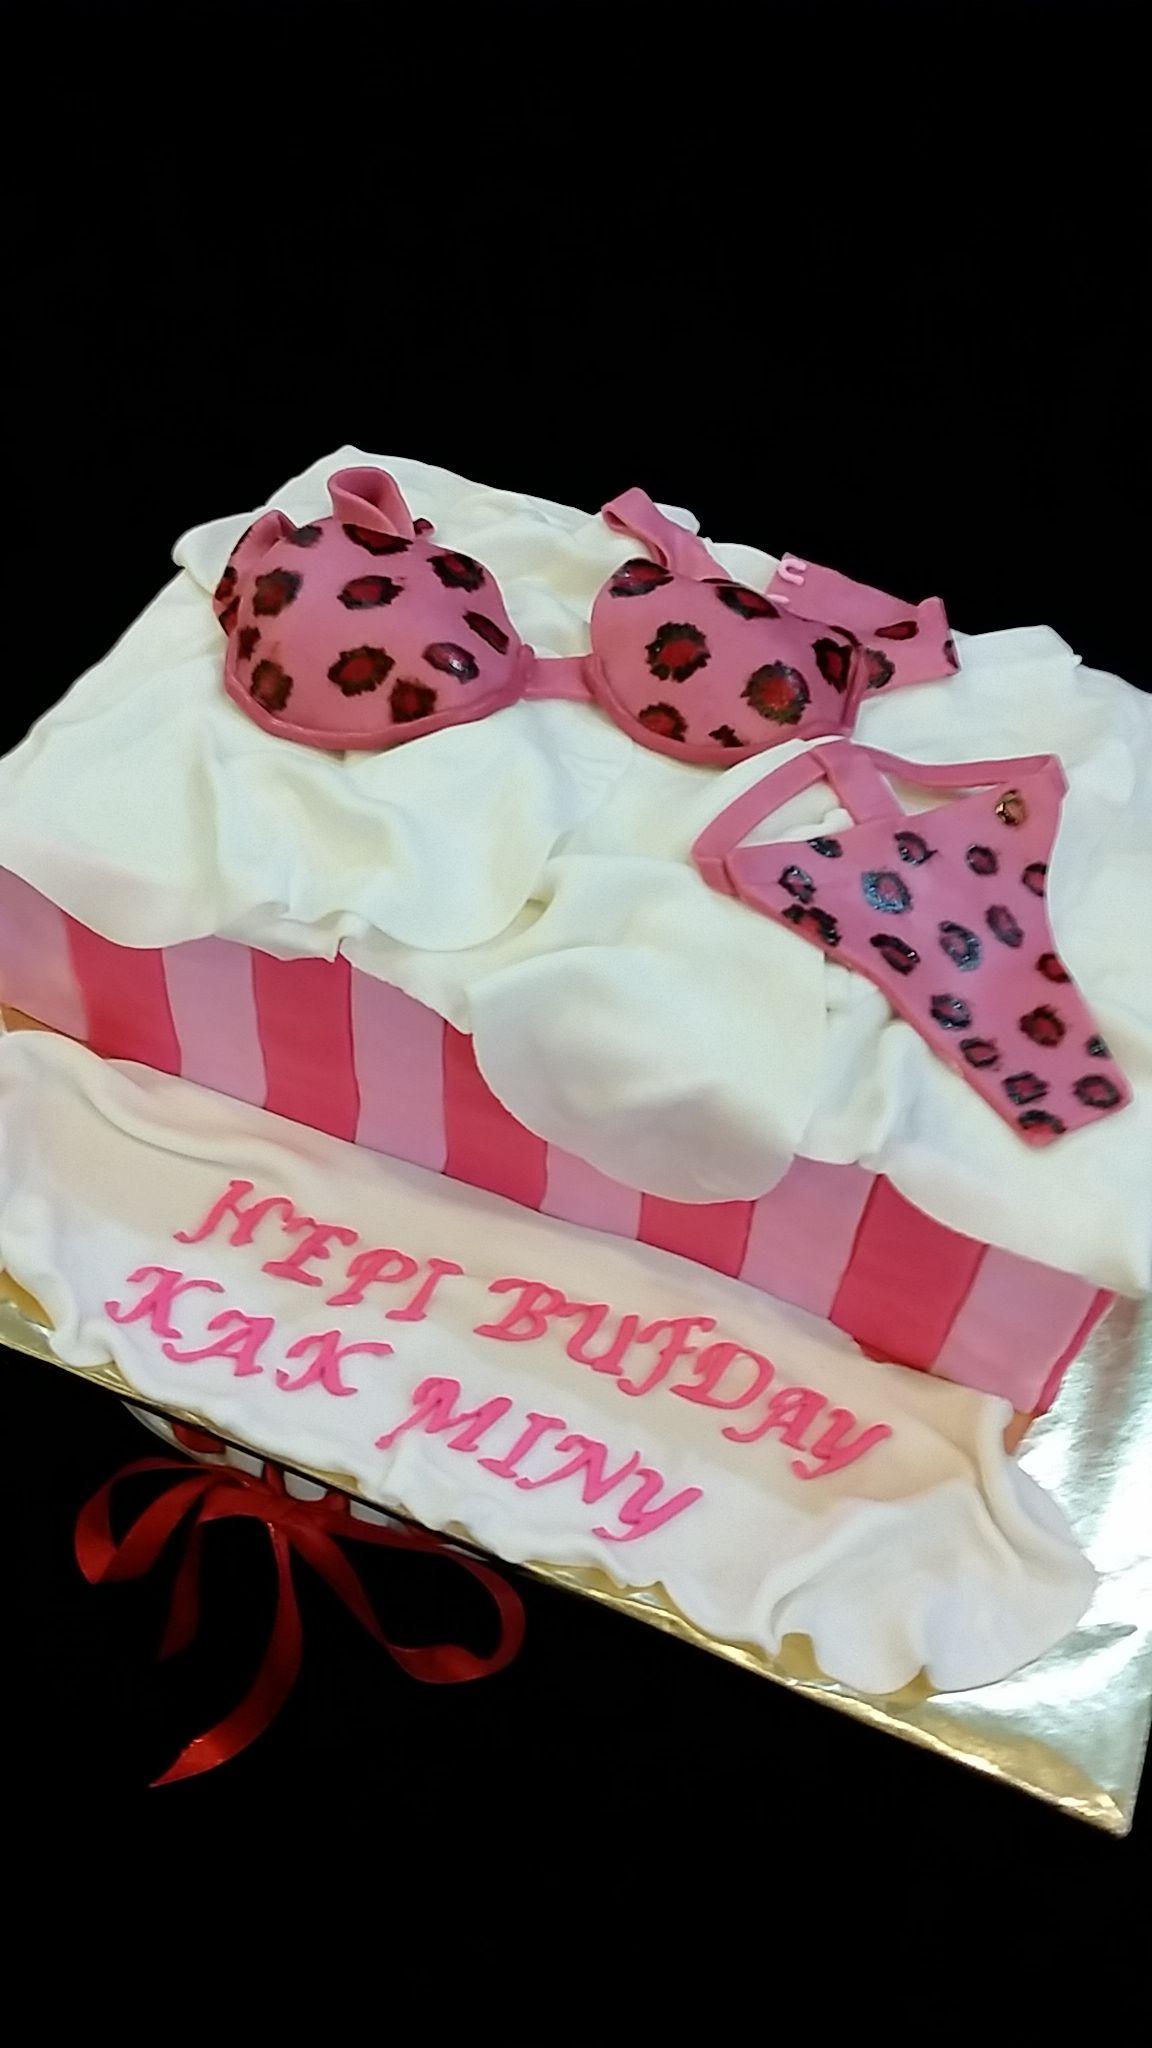 Pink Leopard Victoria Secret Lingerie #sweetcreation20 #cheesecake #victoriasecret #birthday